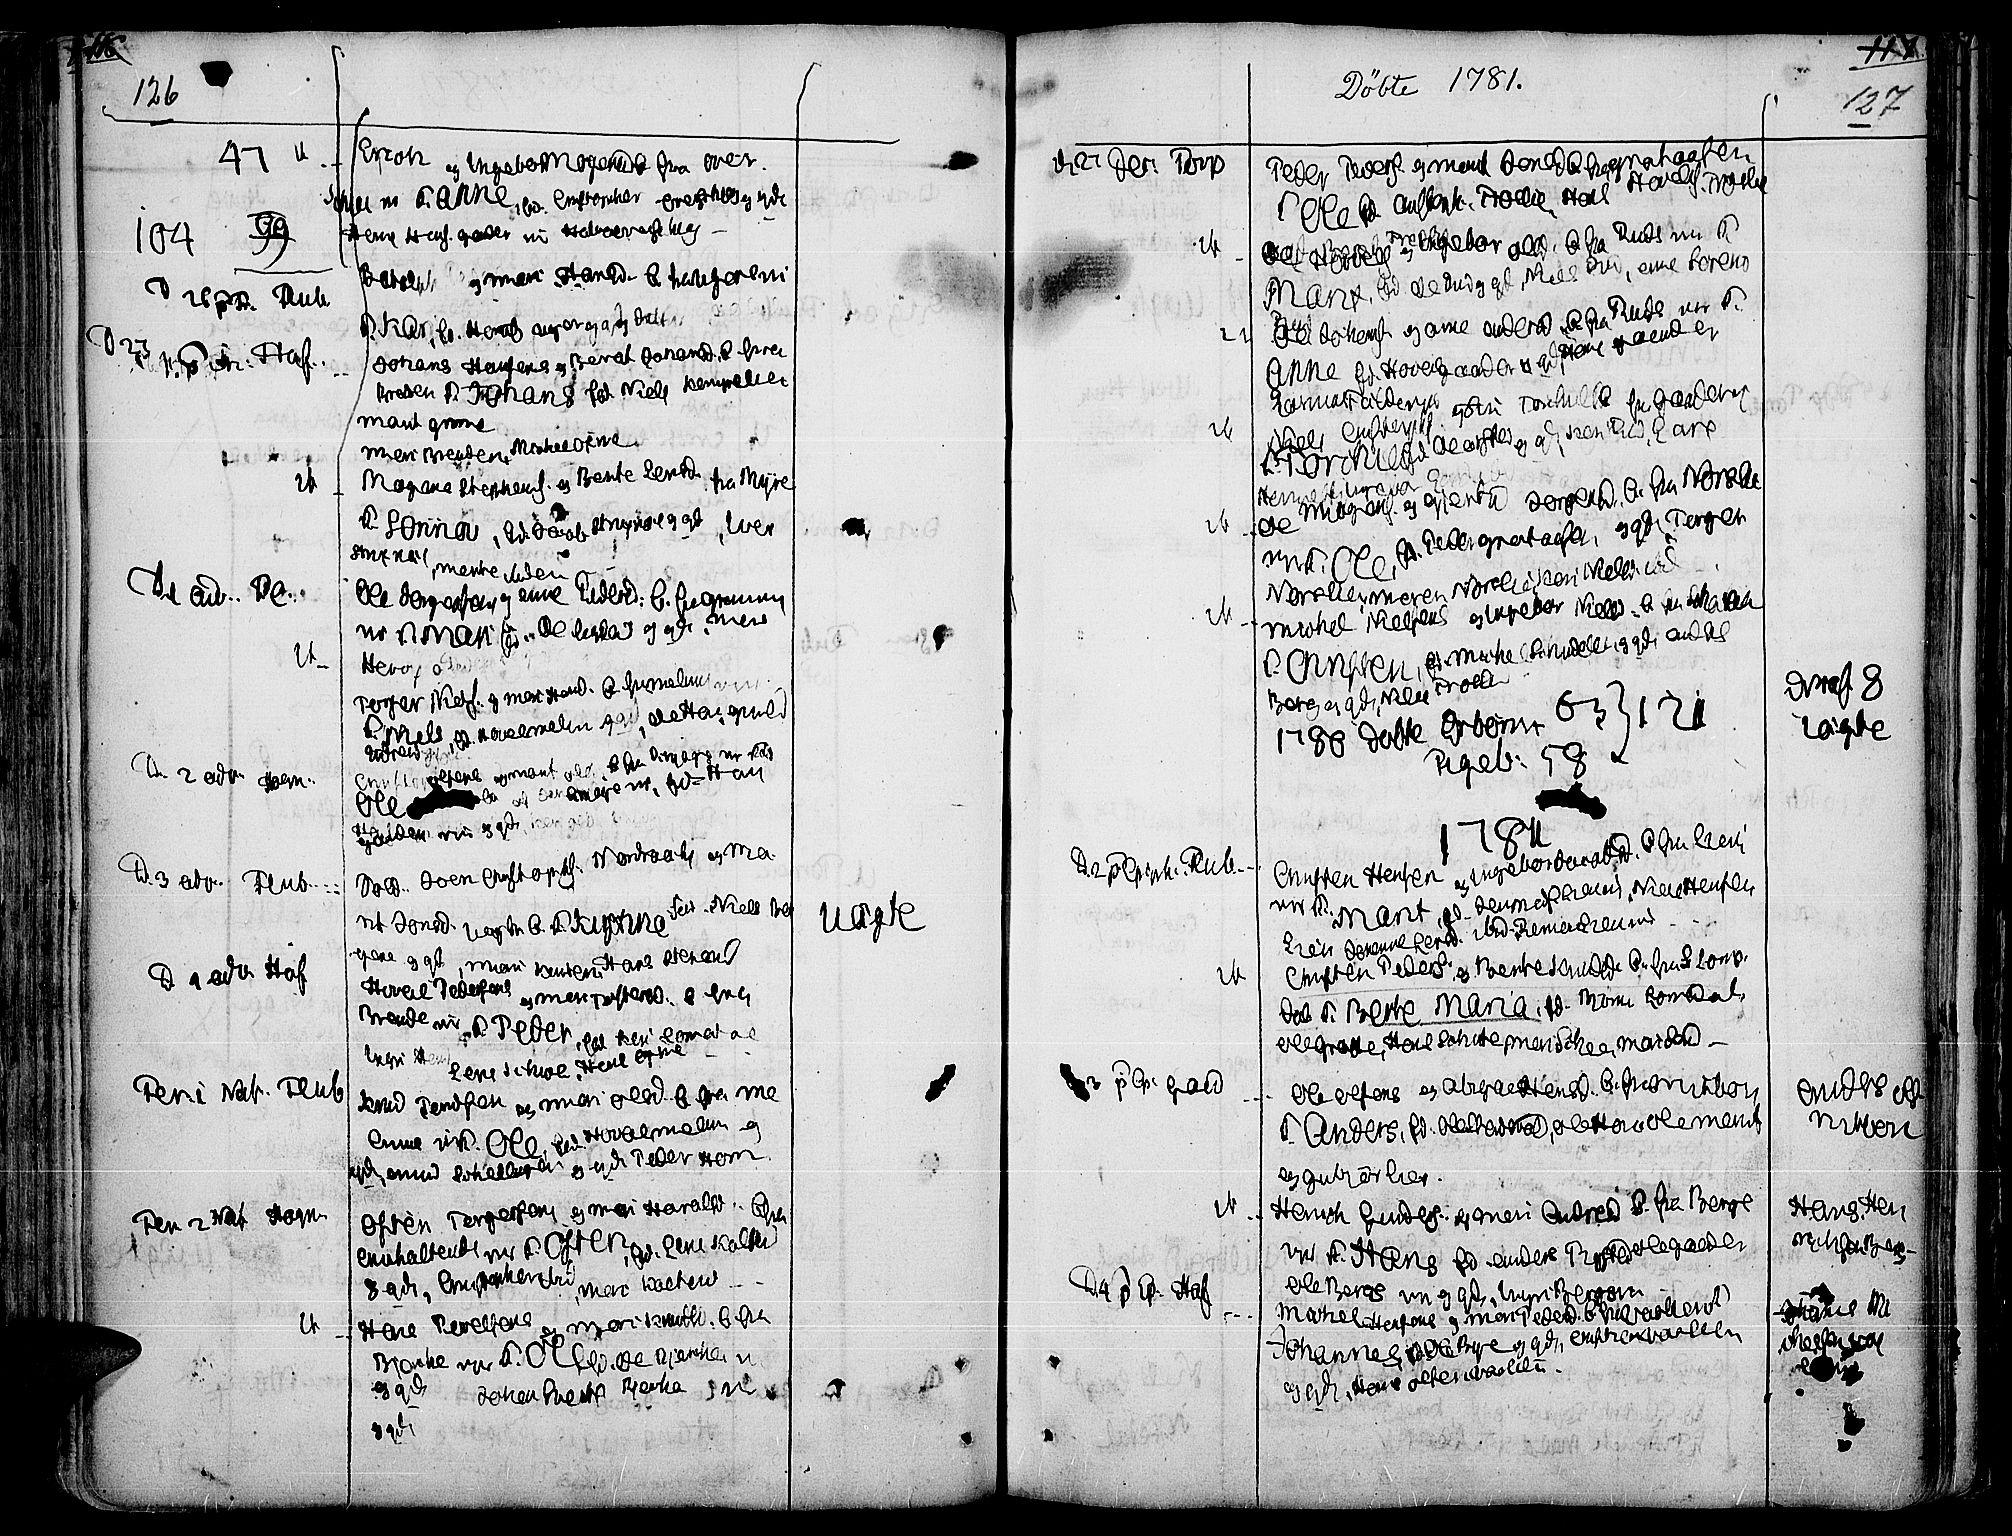 SAH, Land prestekontor, Ministerialbok nr. 5, 1765-1784, s. 126-127